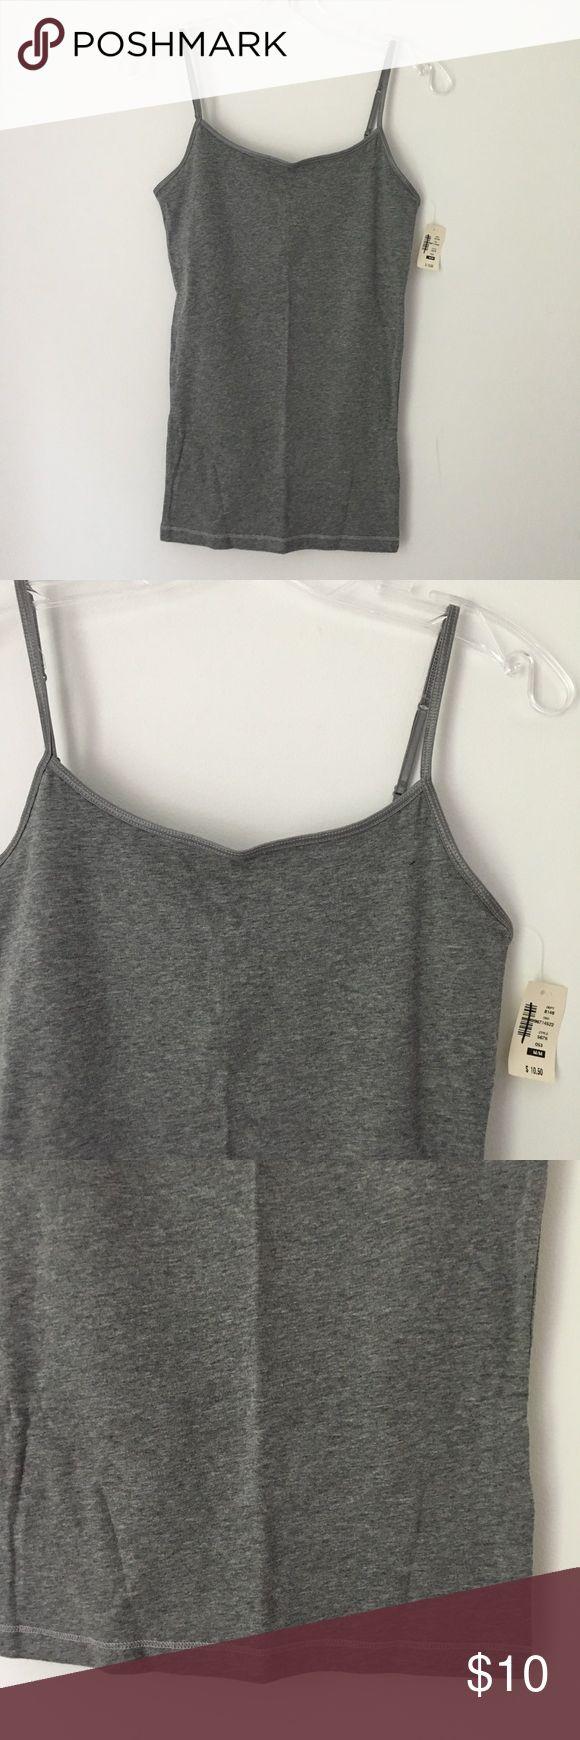 25+ best Camisole with shelf bra ideas on Pinterest | Icra rating ...